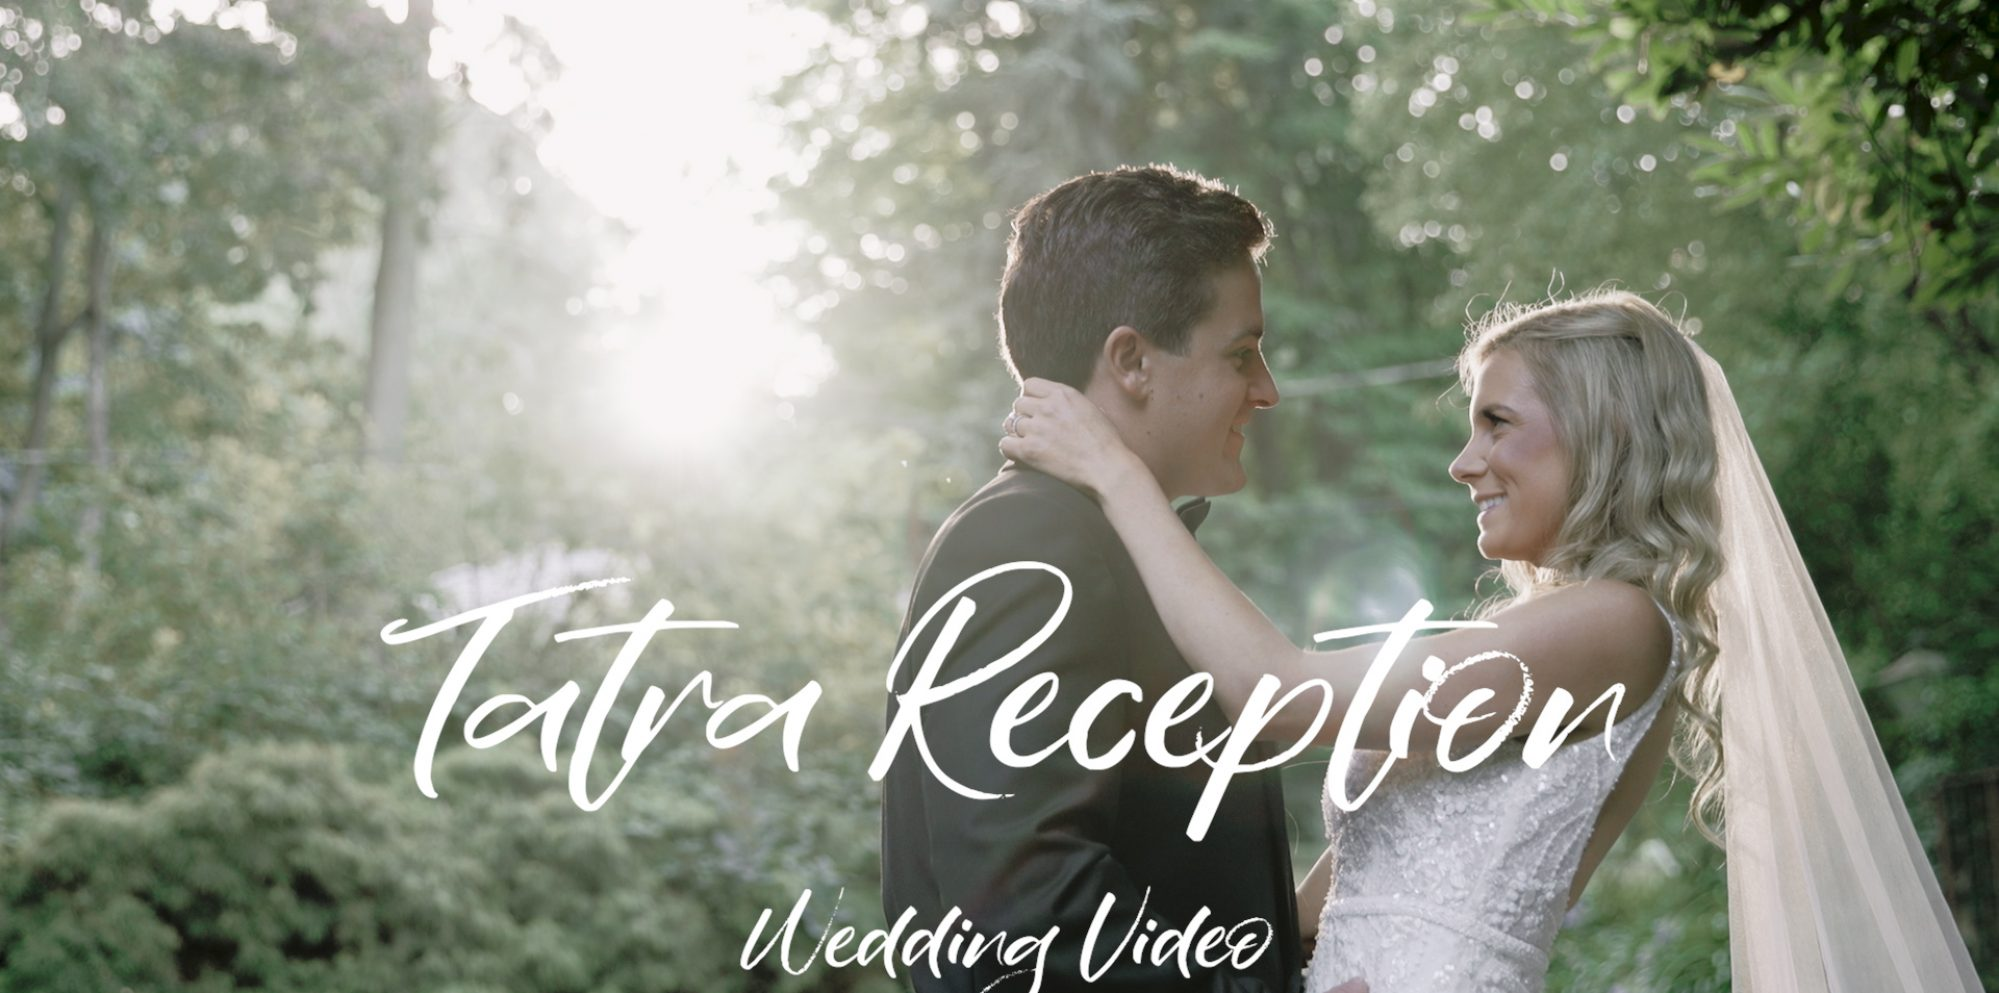 Sarah & matt melbourne wedding videography @tatra rreceptions